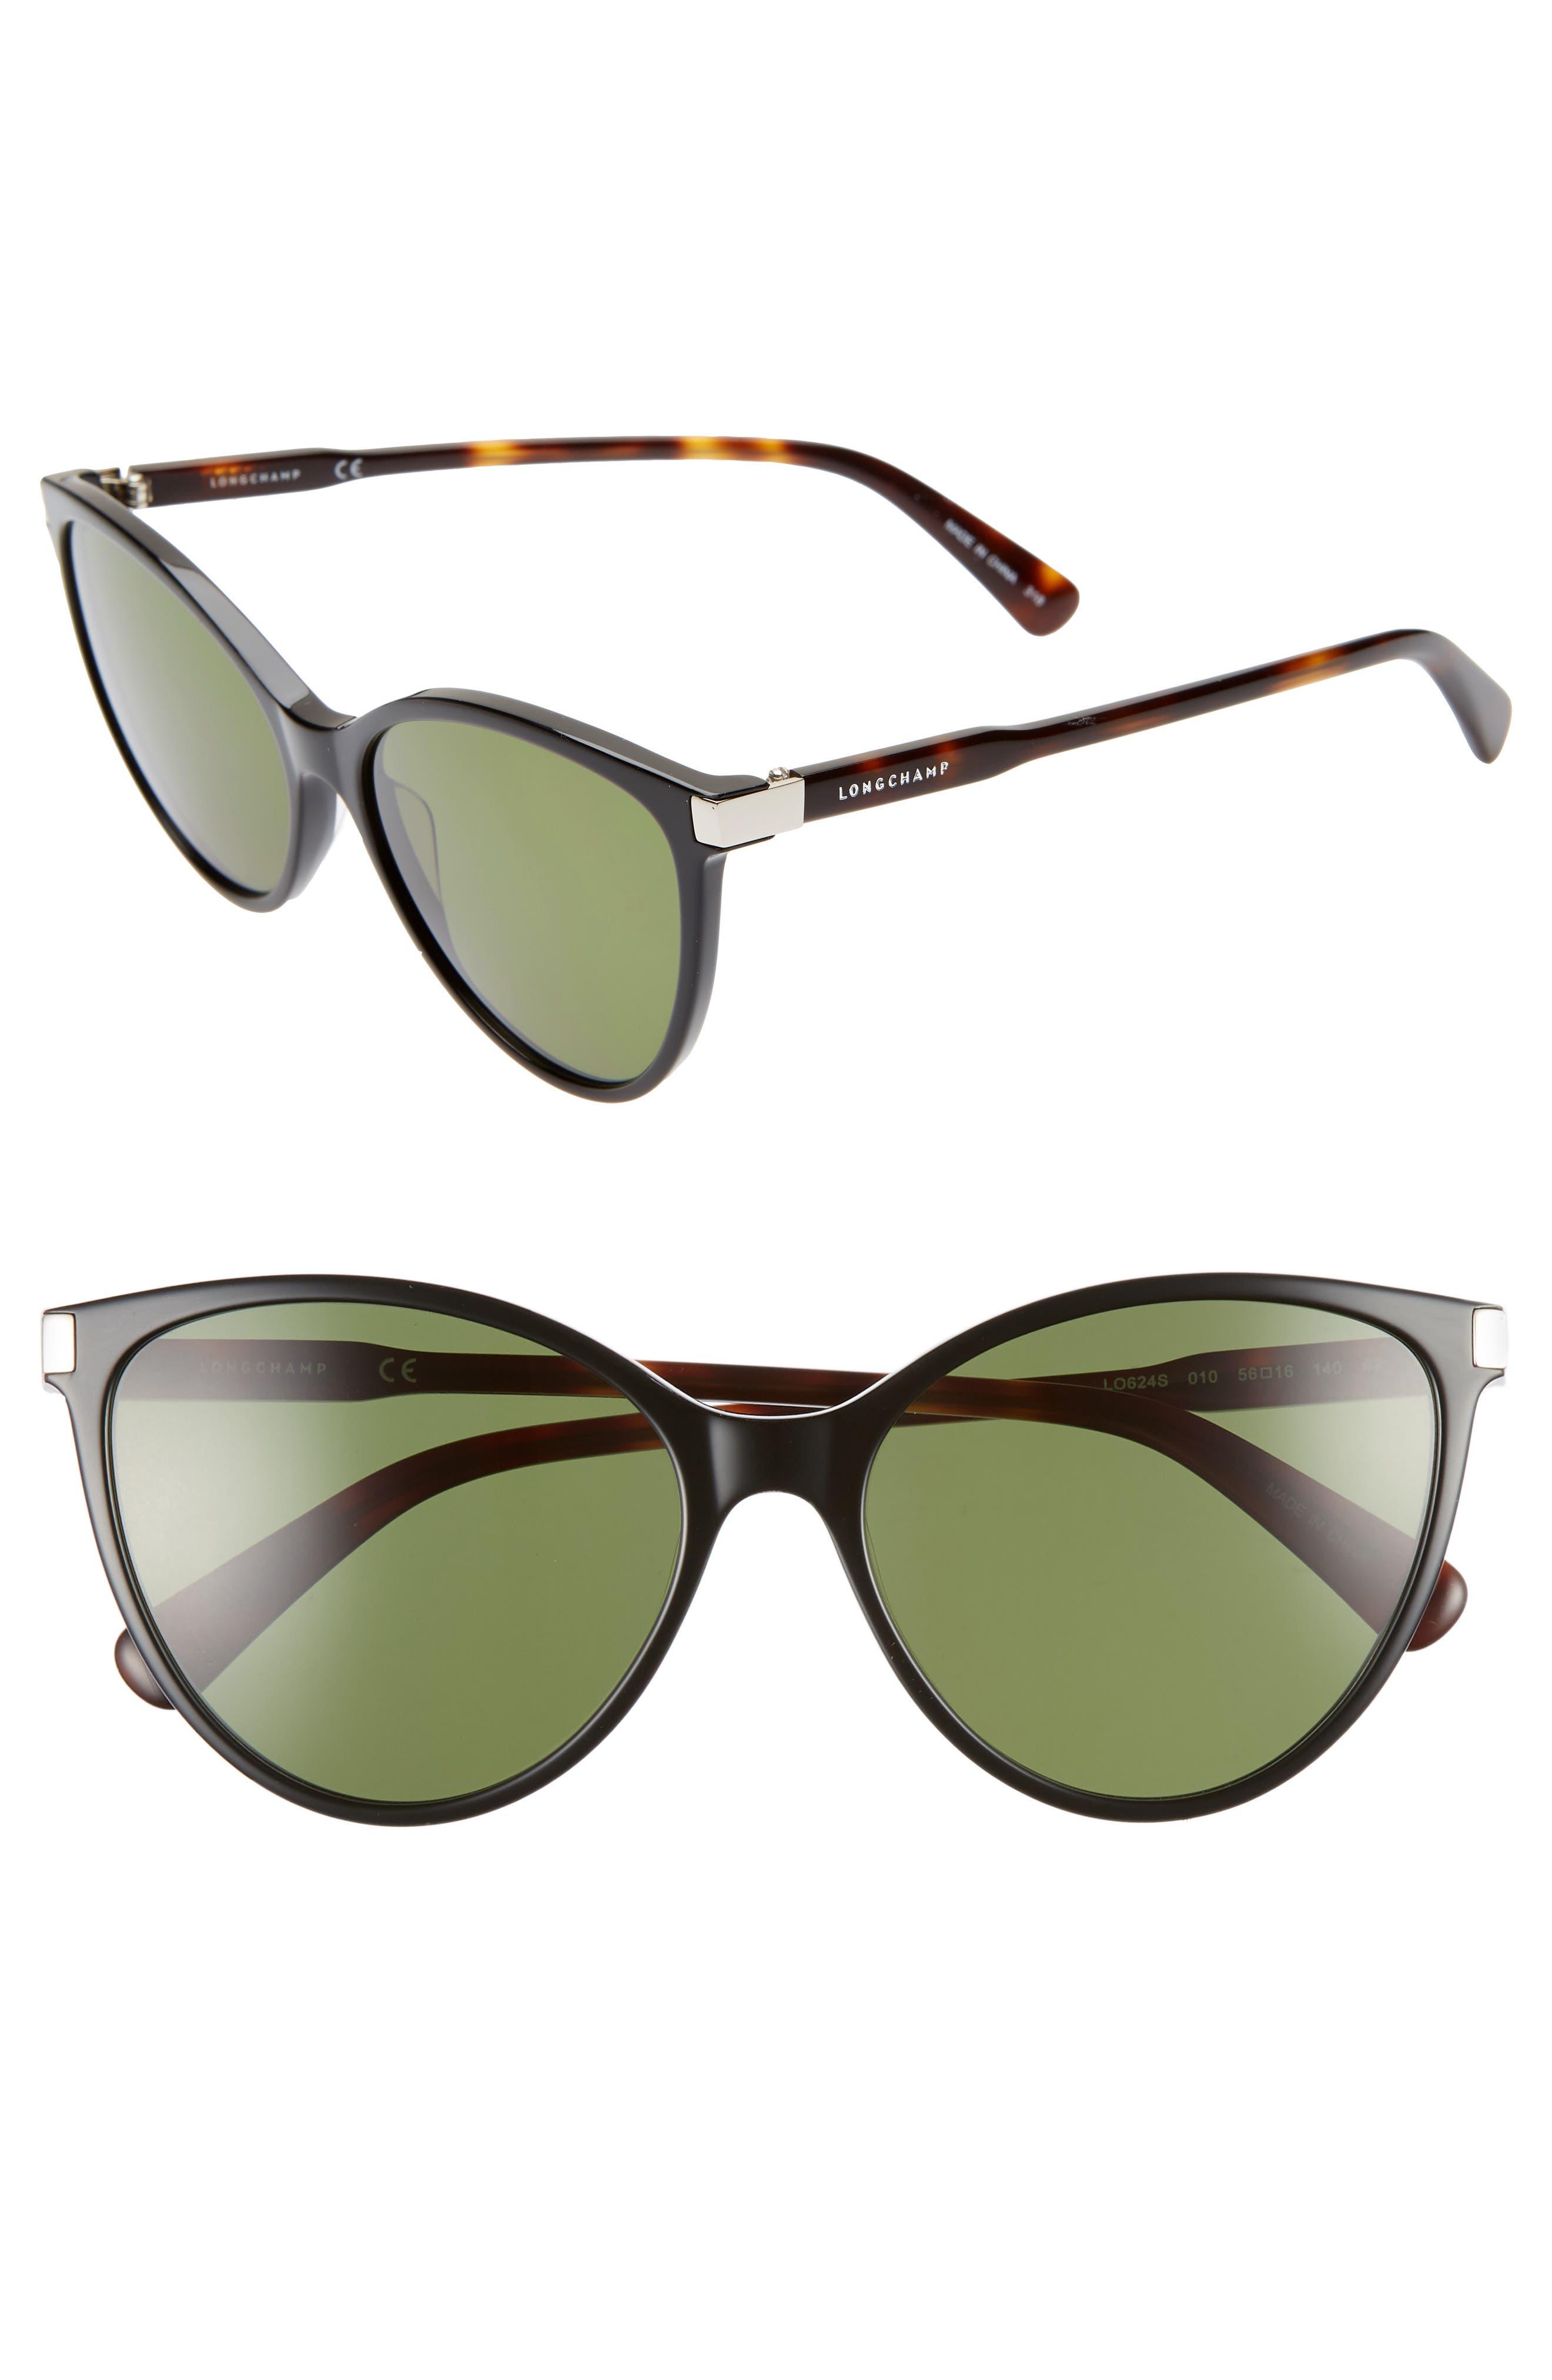 51280daba9 Longchamp Le Pliage 5m Cat Eye Sunglasses - Black  Havana